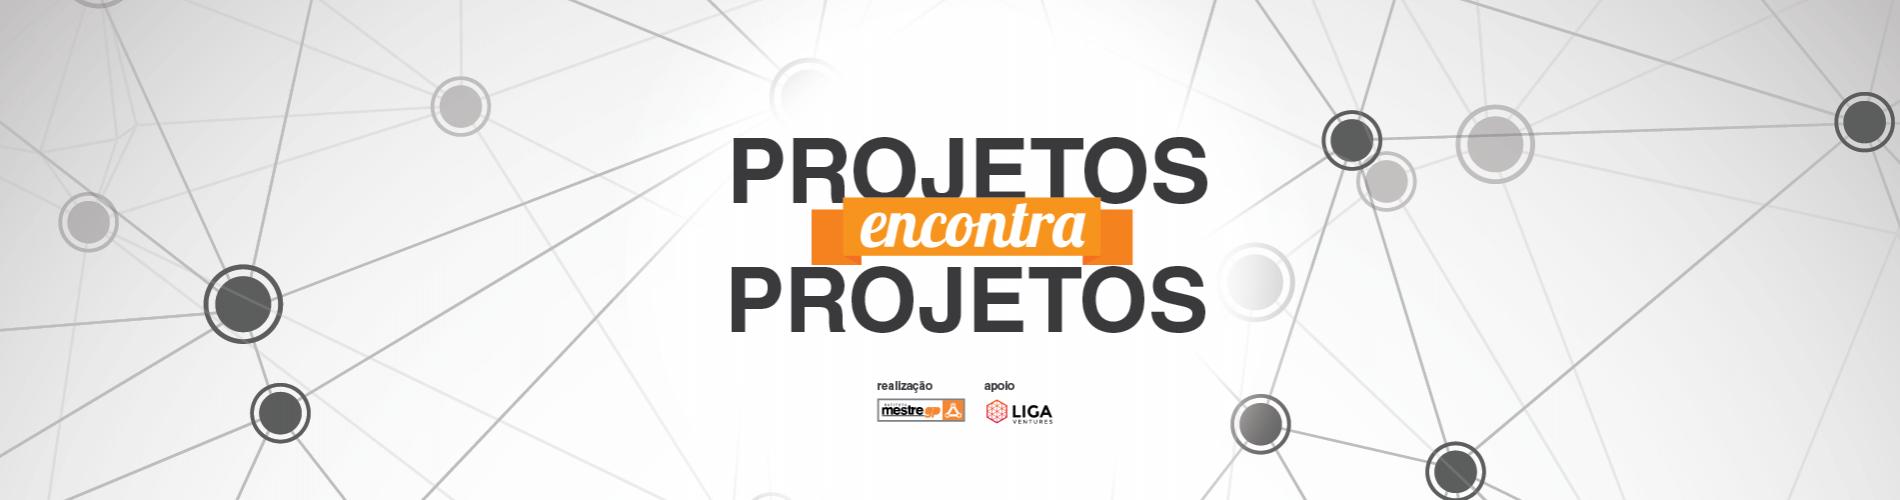 http://www.mestregp.com.br/wp-content/uploads/2017/05/projetoEncontraProjeto_topoSite-1900x500.png